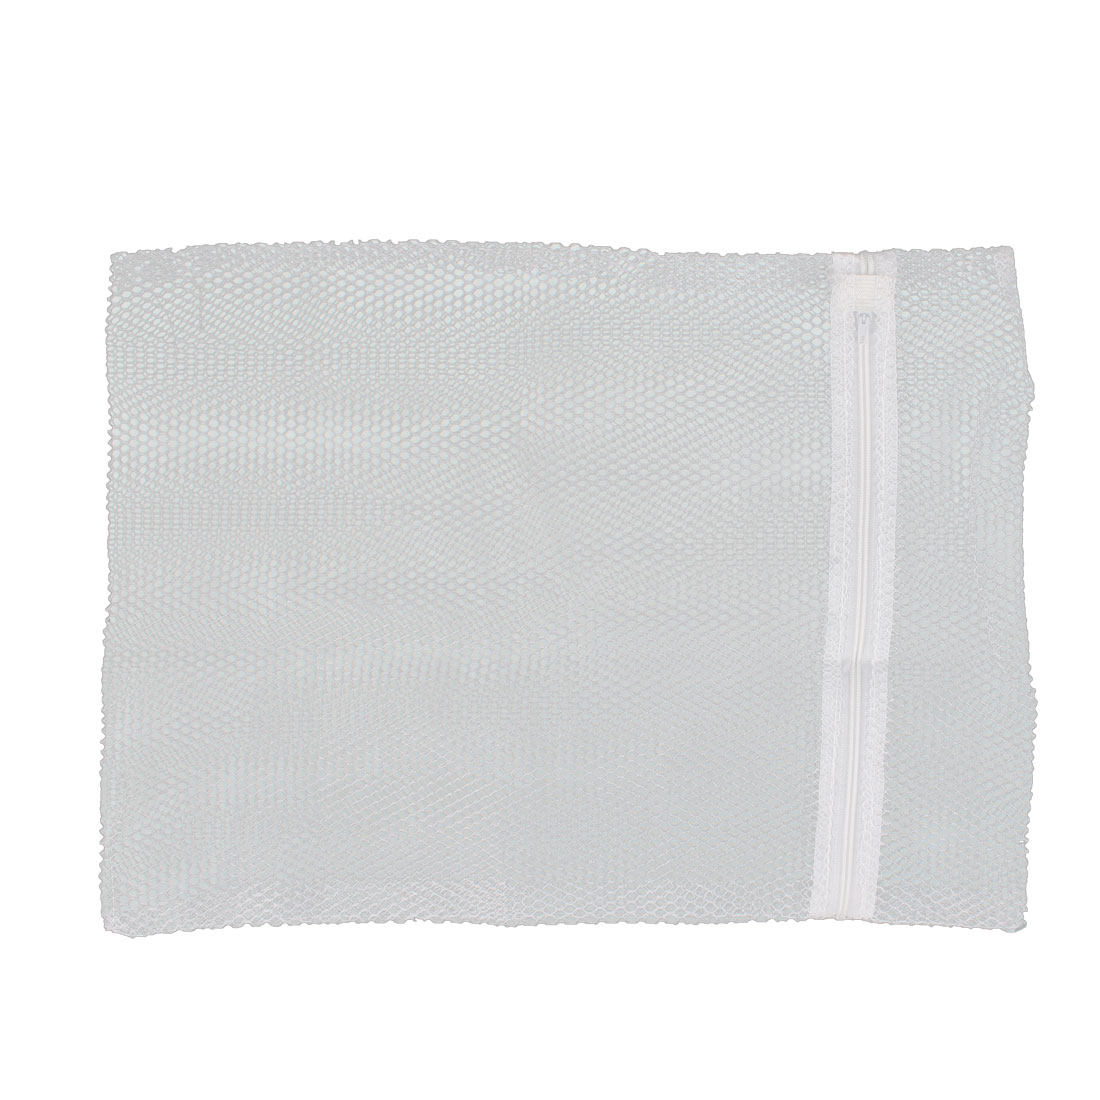 Laundry Cloth Bras Underwear Mesh Net Zipper Washing Protector Bag White